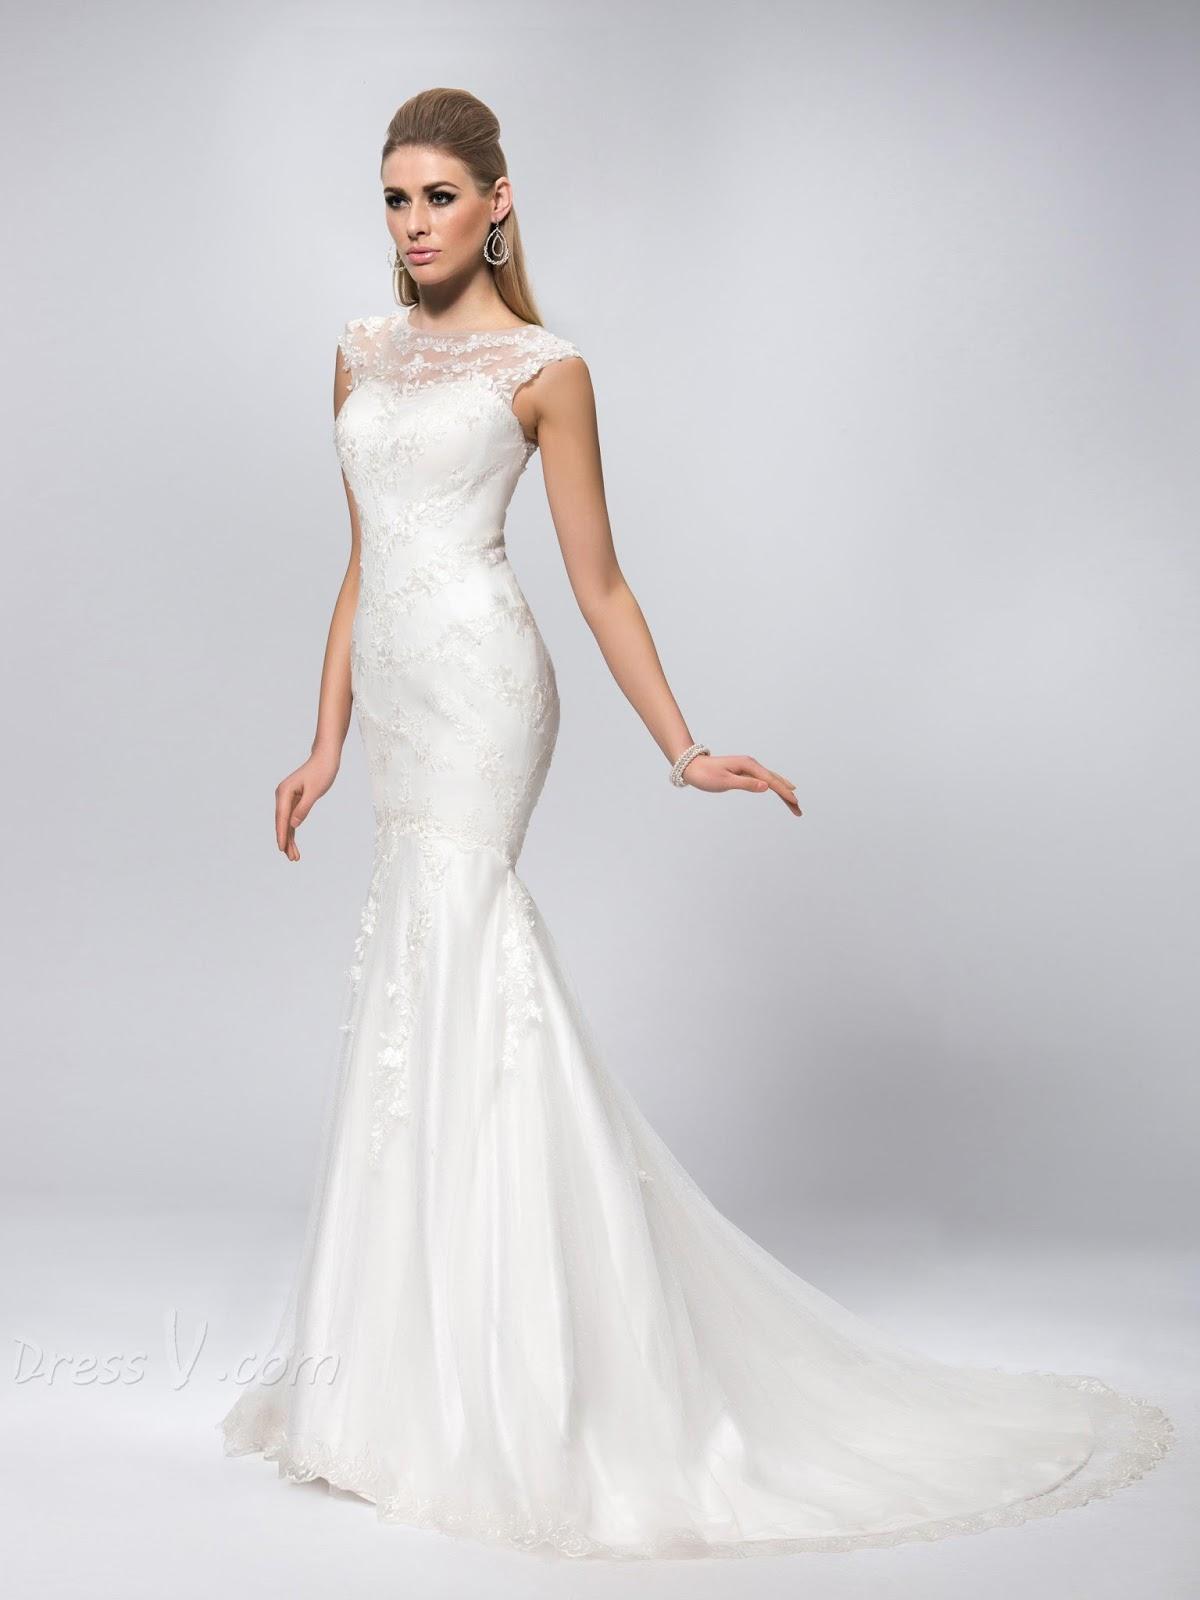 mermaid tail wedding dresses photo - 1